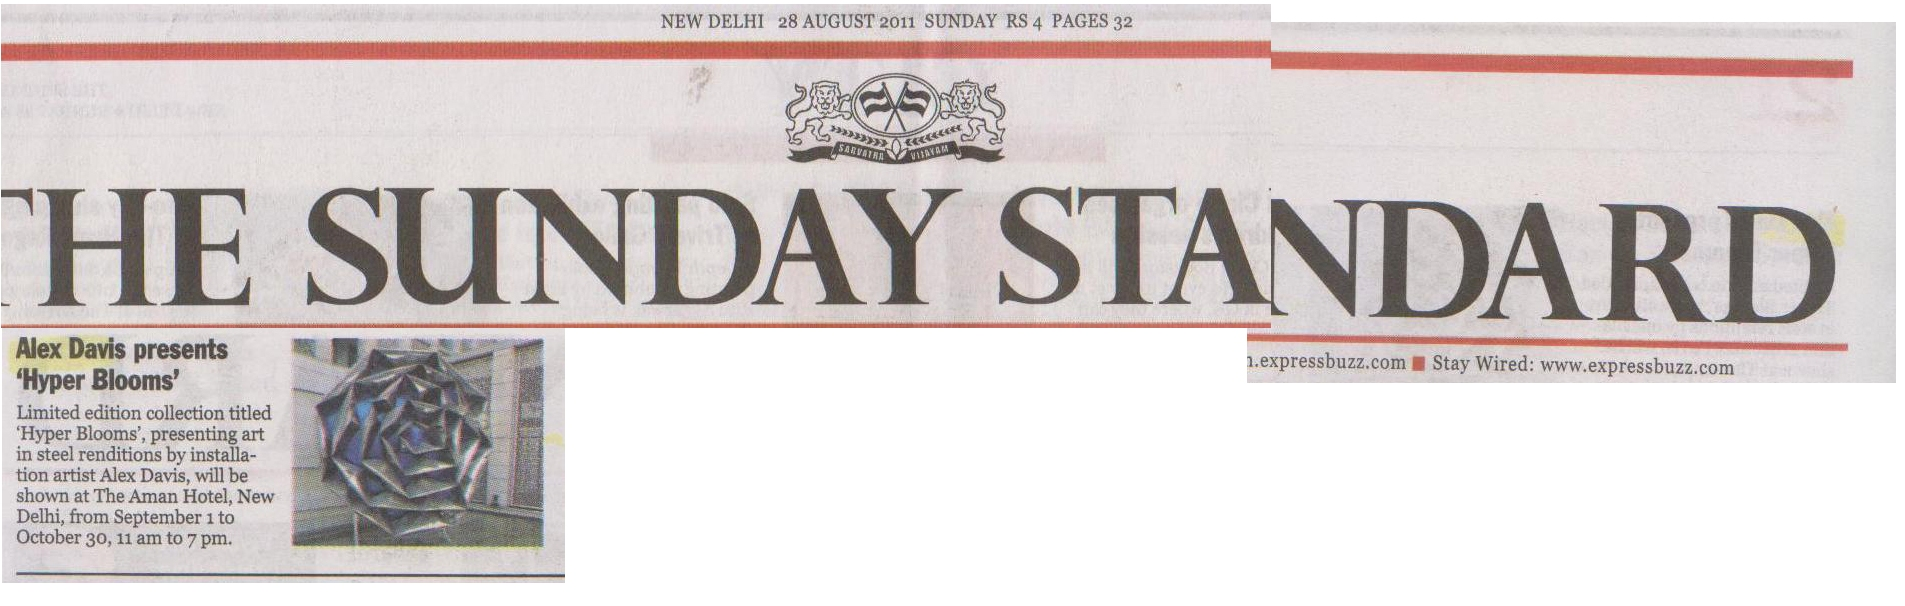 The Sunday Standard '11